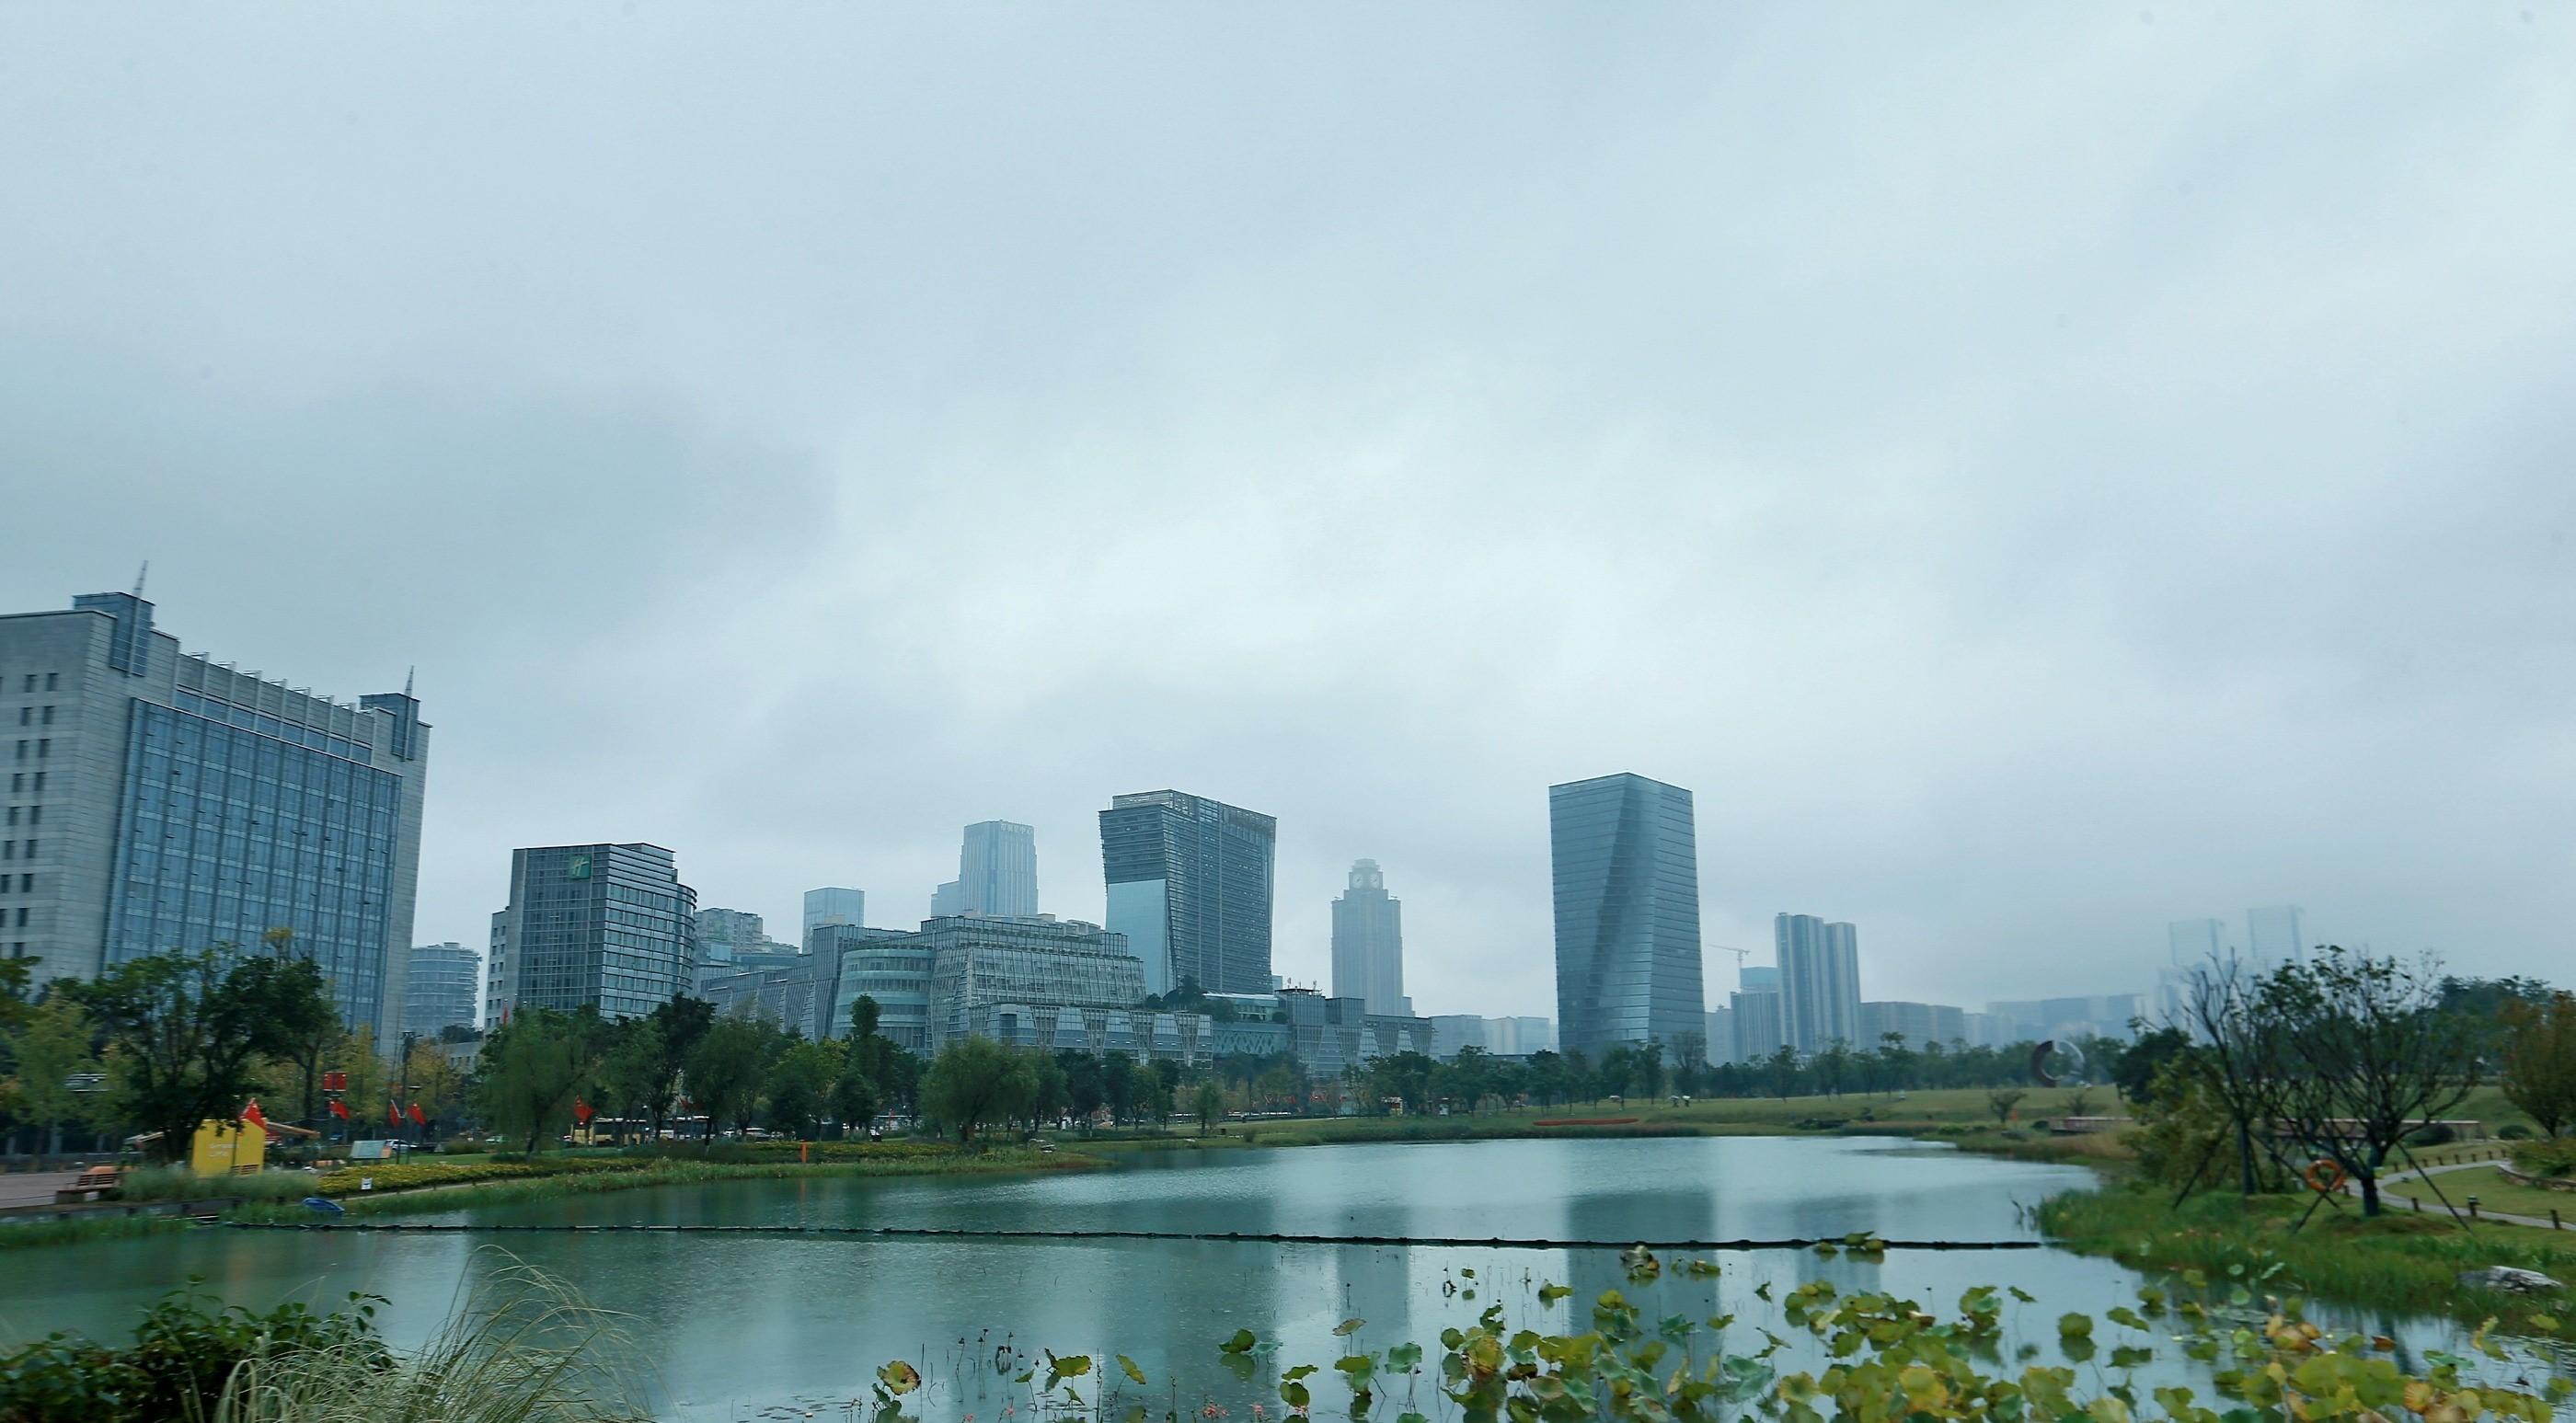 Chengdu greenway